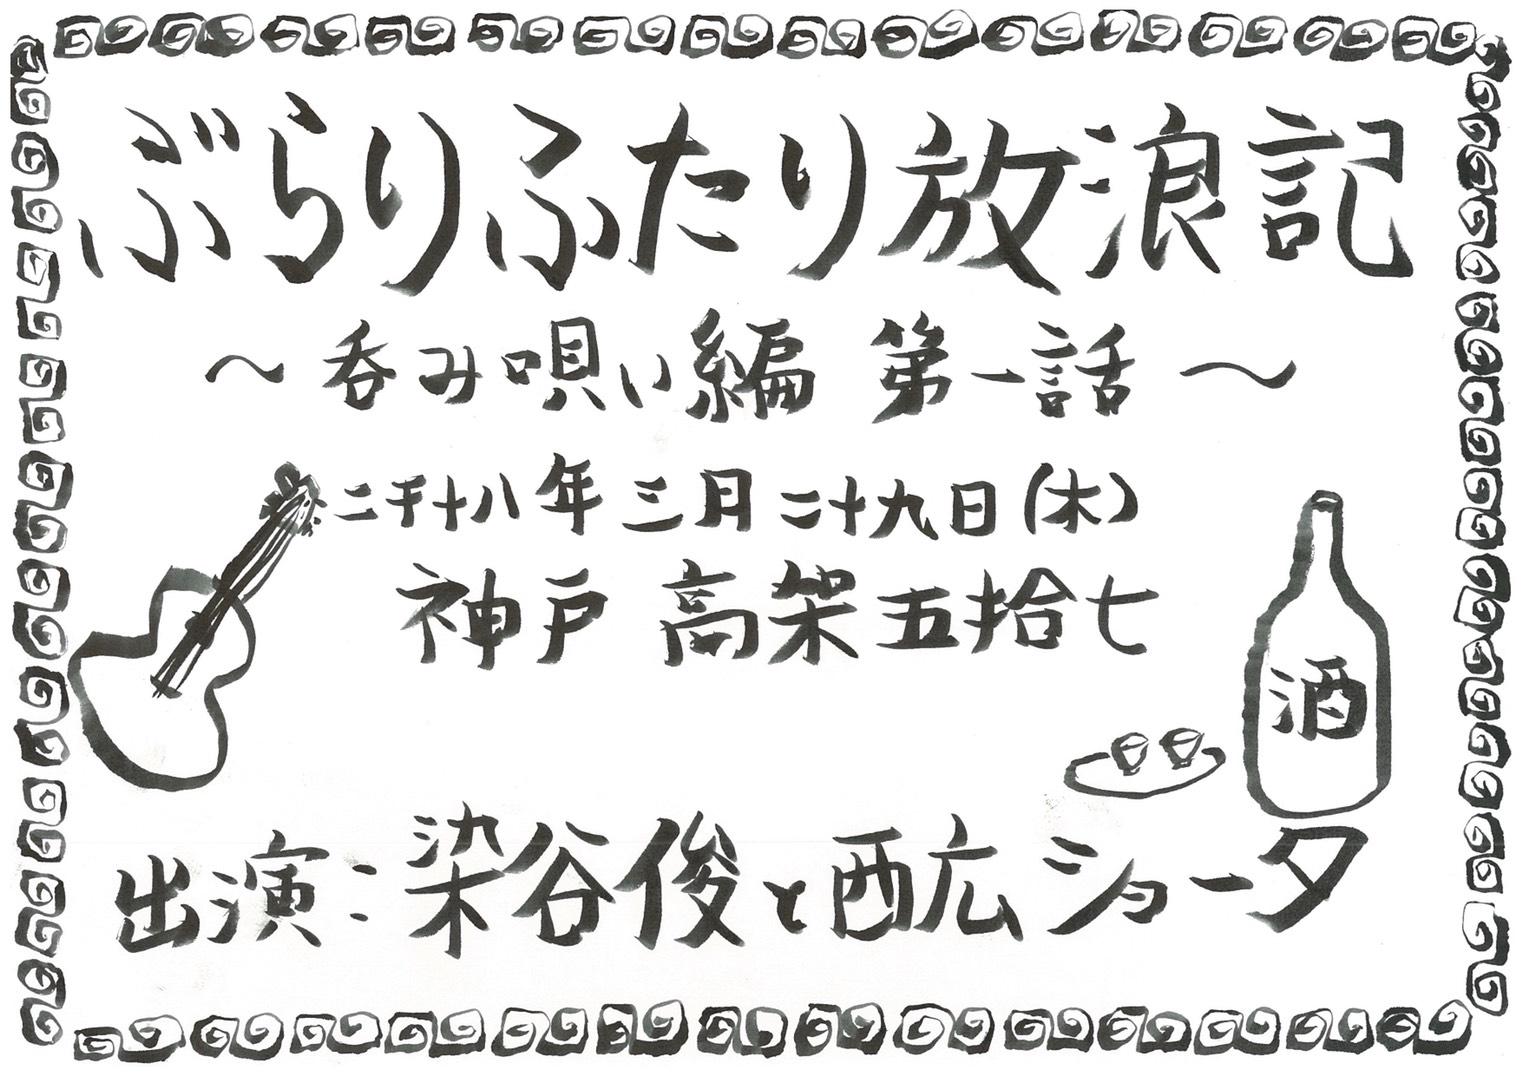 SOLD OUT! 染谷俊デビュー25周年LIVE TOUR~番外編~ 『ぶらりふたり放浪記~呑み唄い編、第1話~』 @ 高架伍拾七